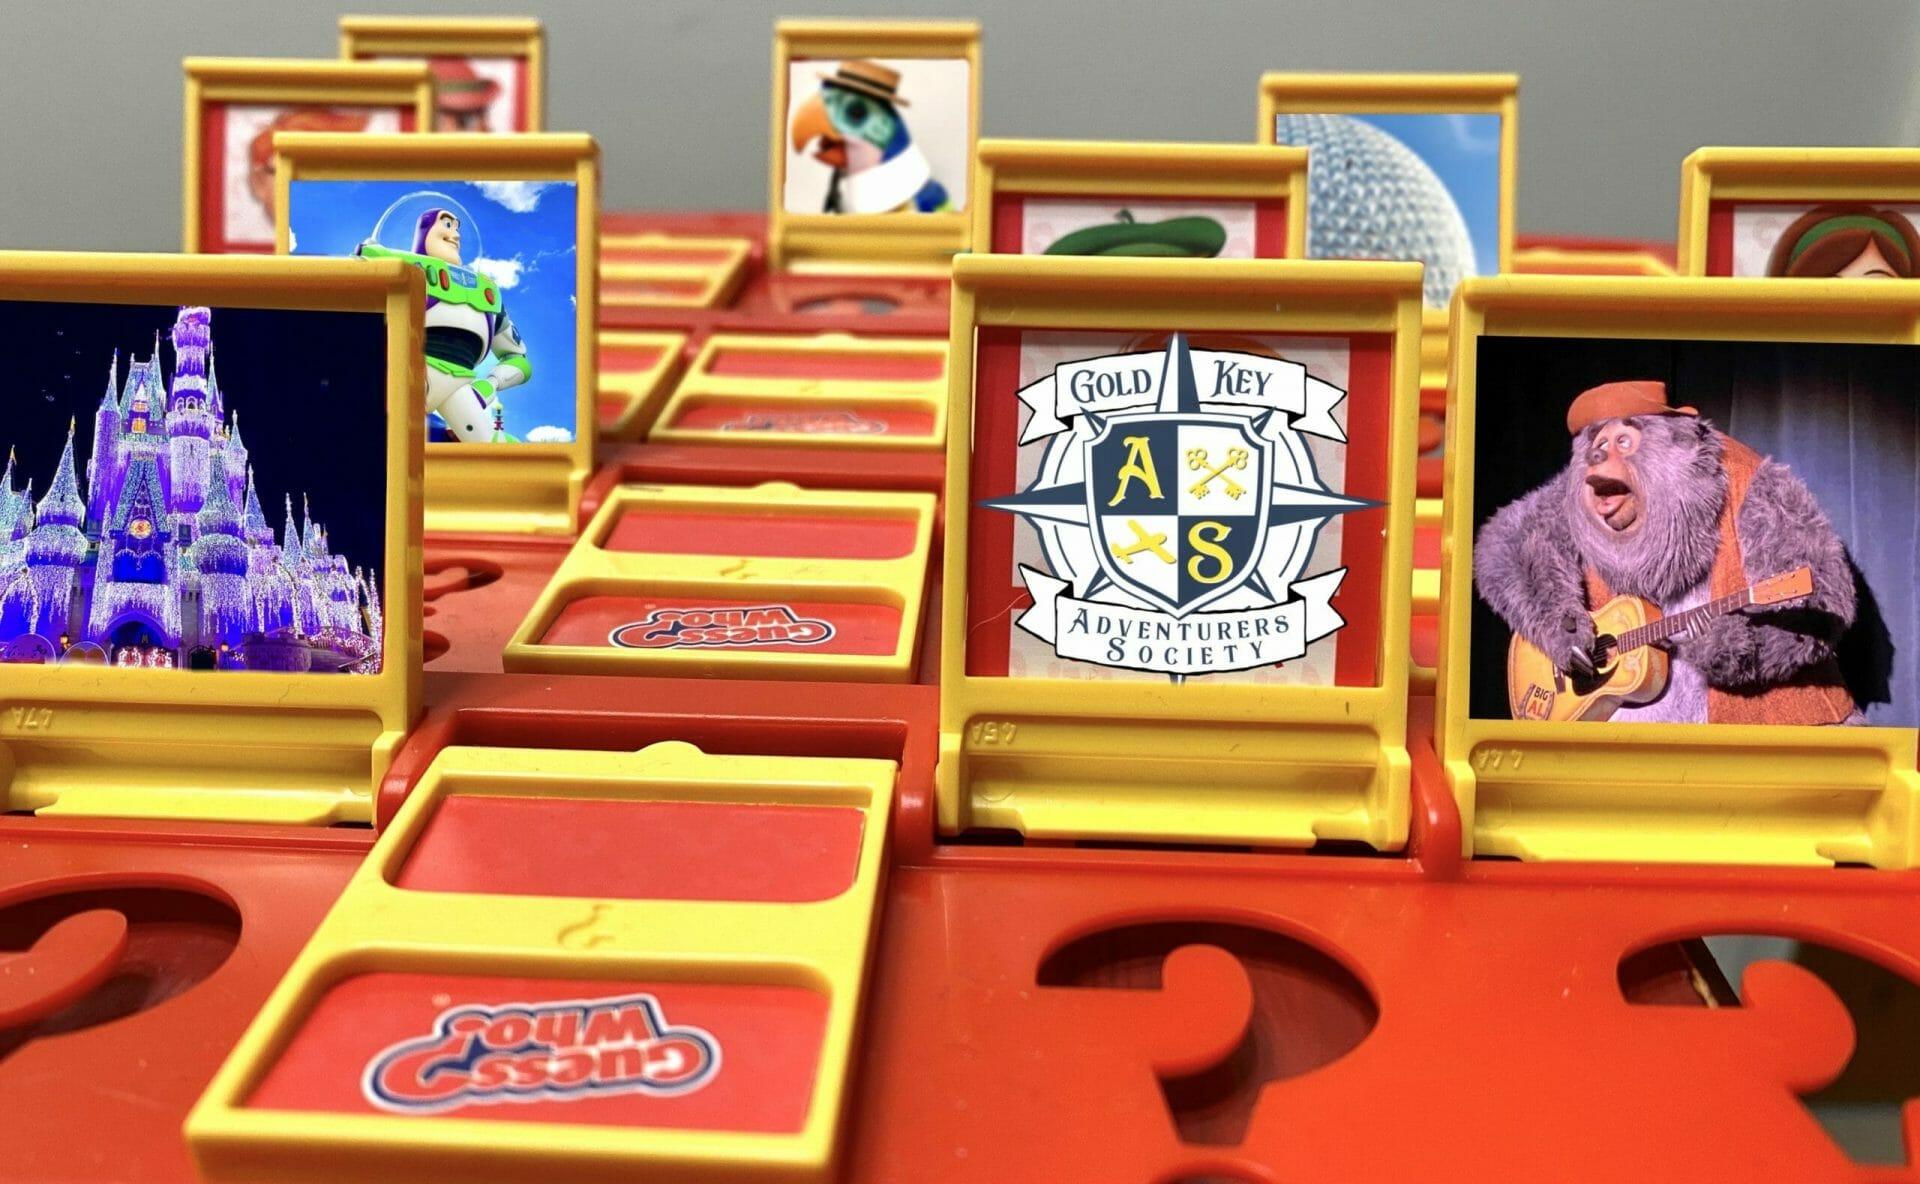 Gold Key Adventurers Society Podcast: Fun & Games – Disney Style